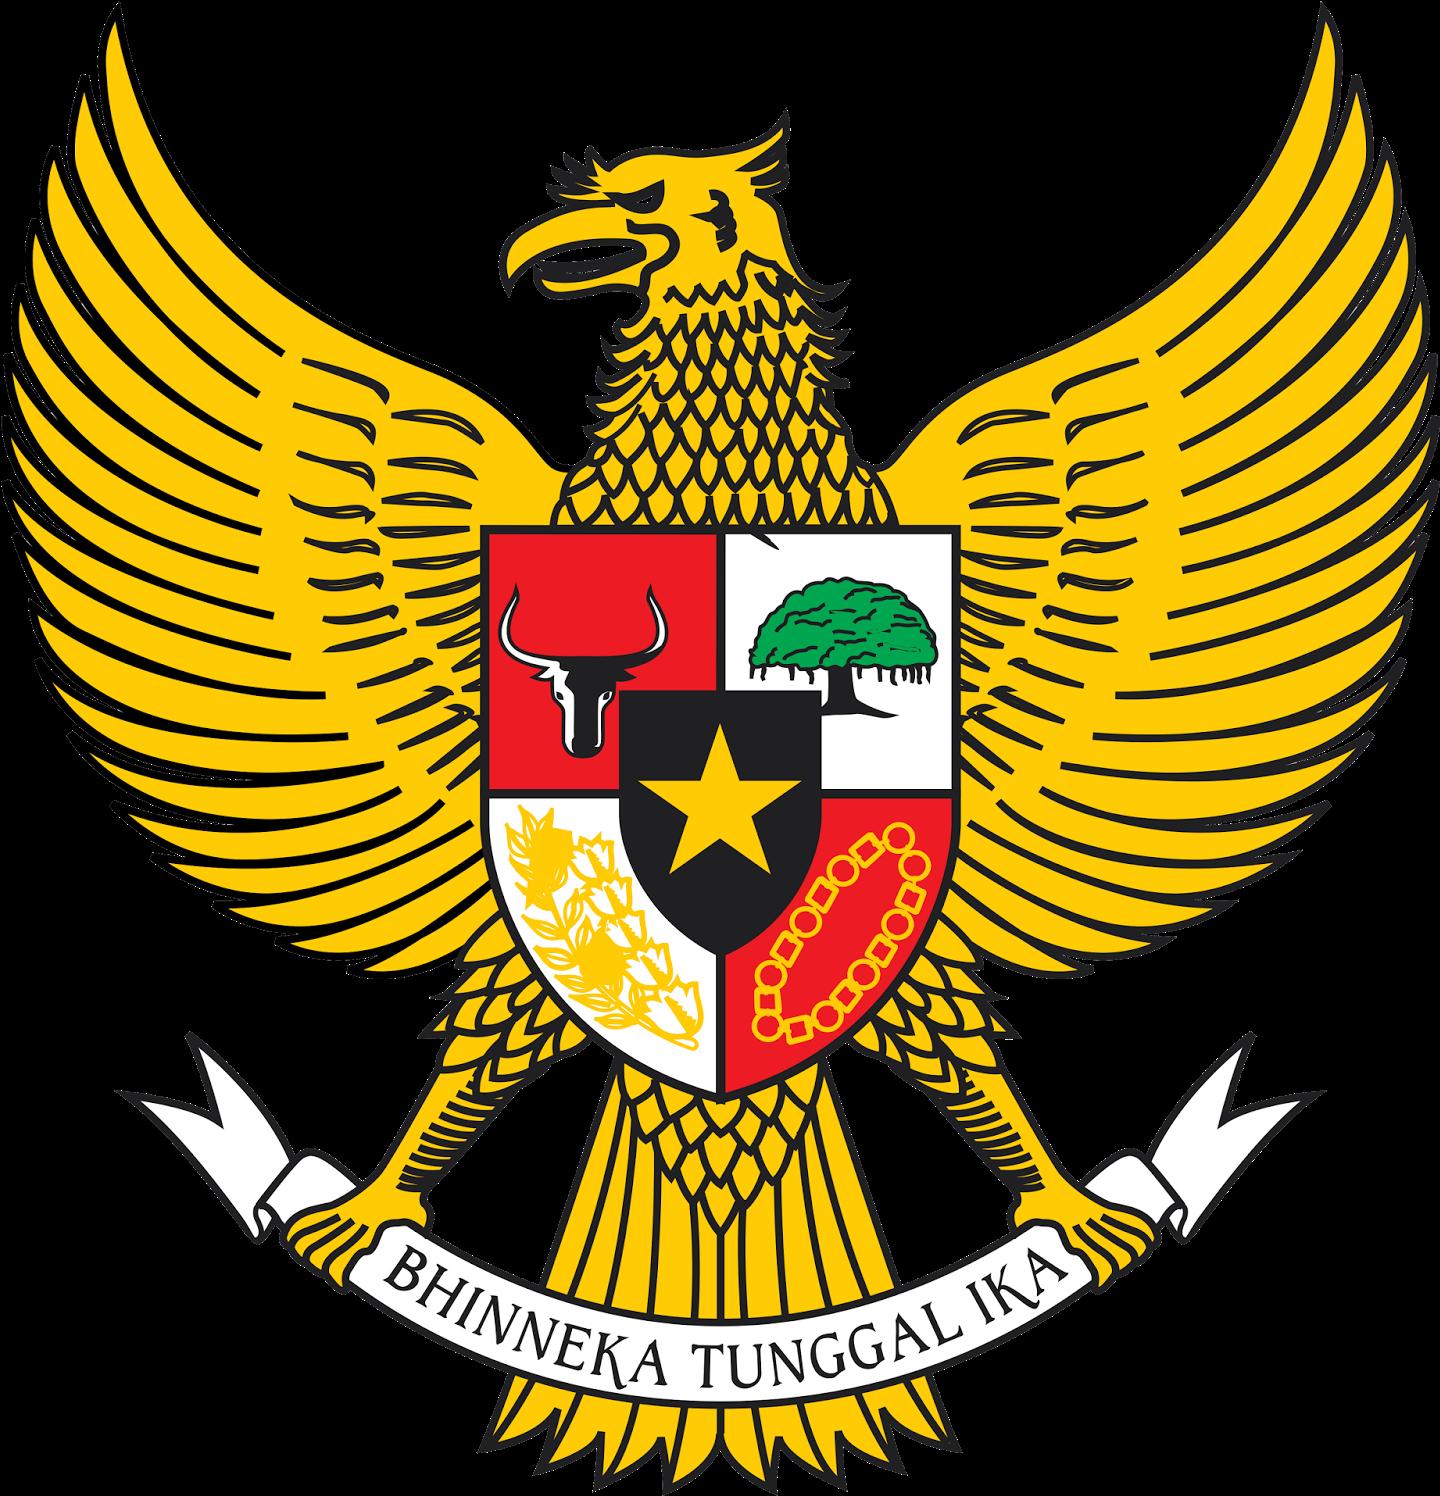 HD Garuda Pancasila Png Images.